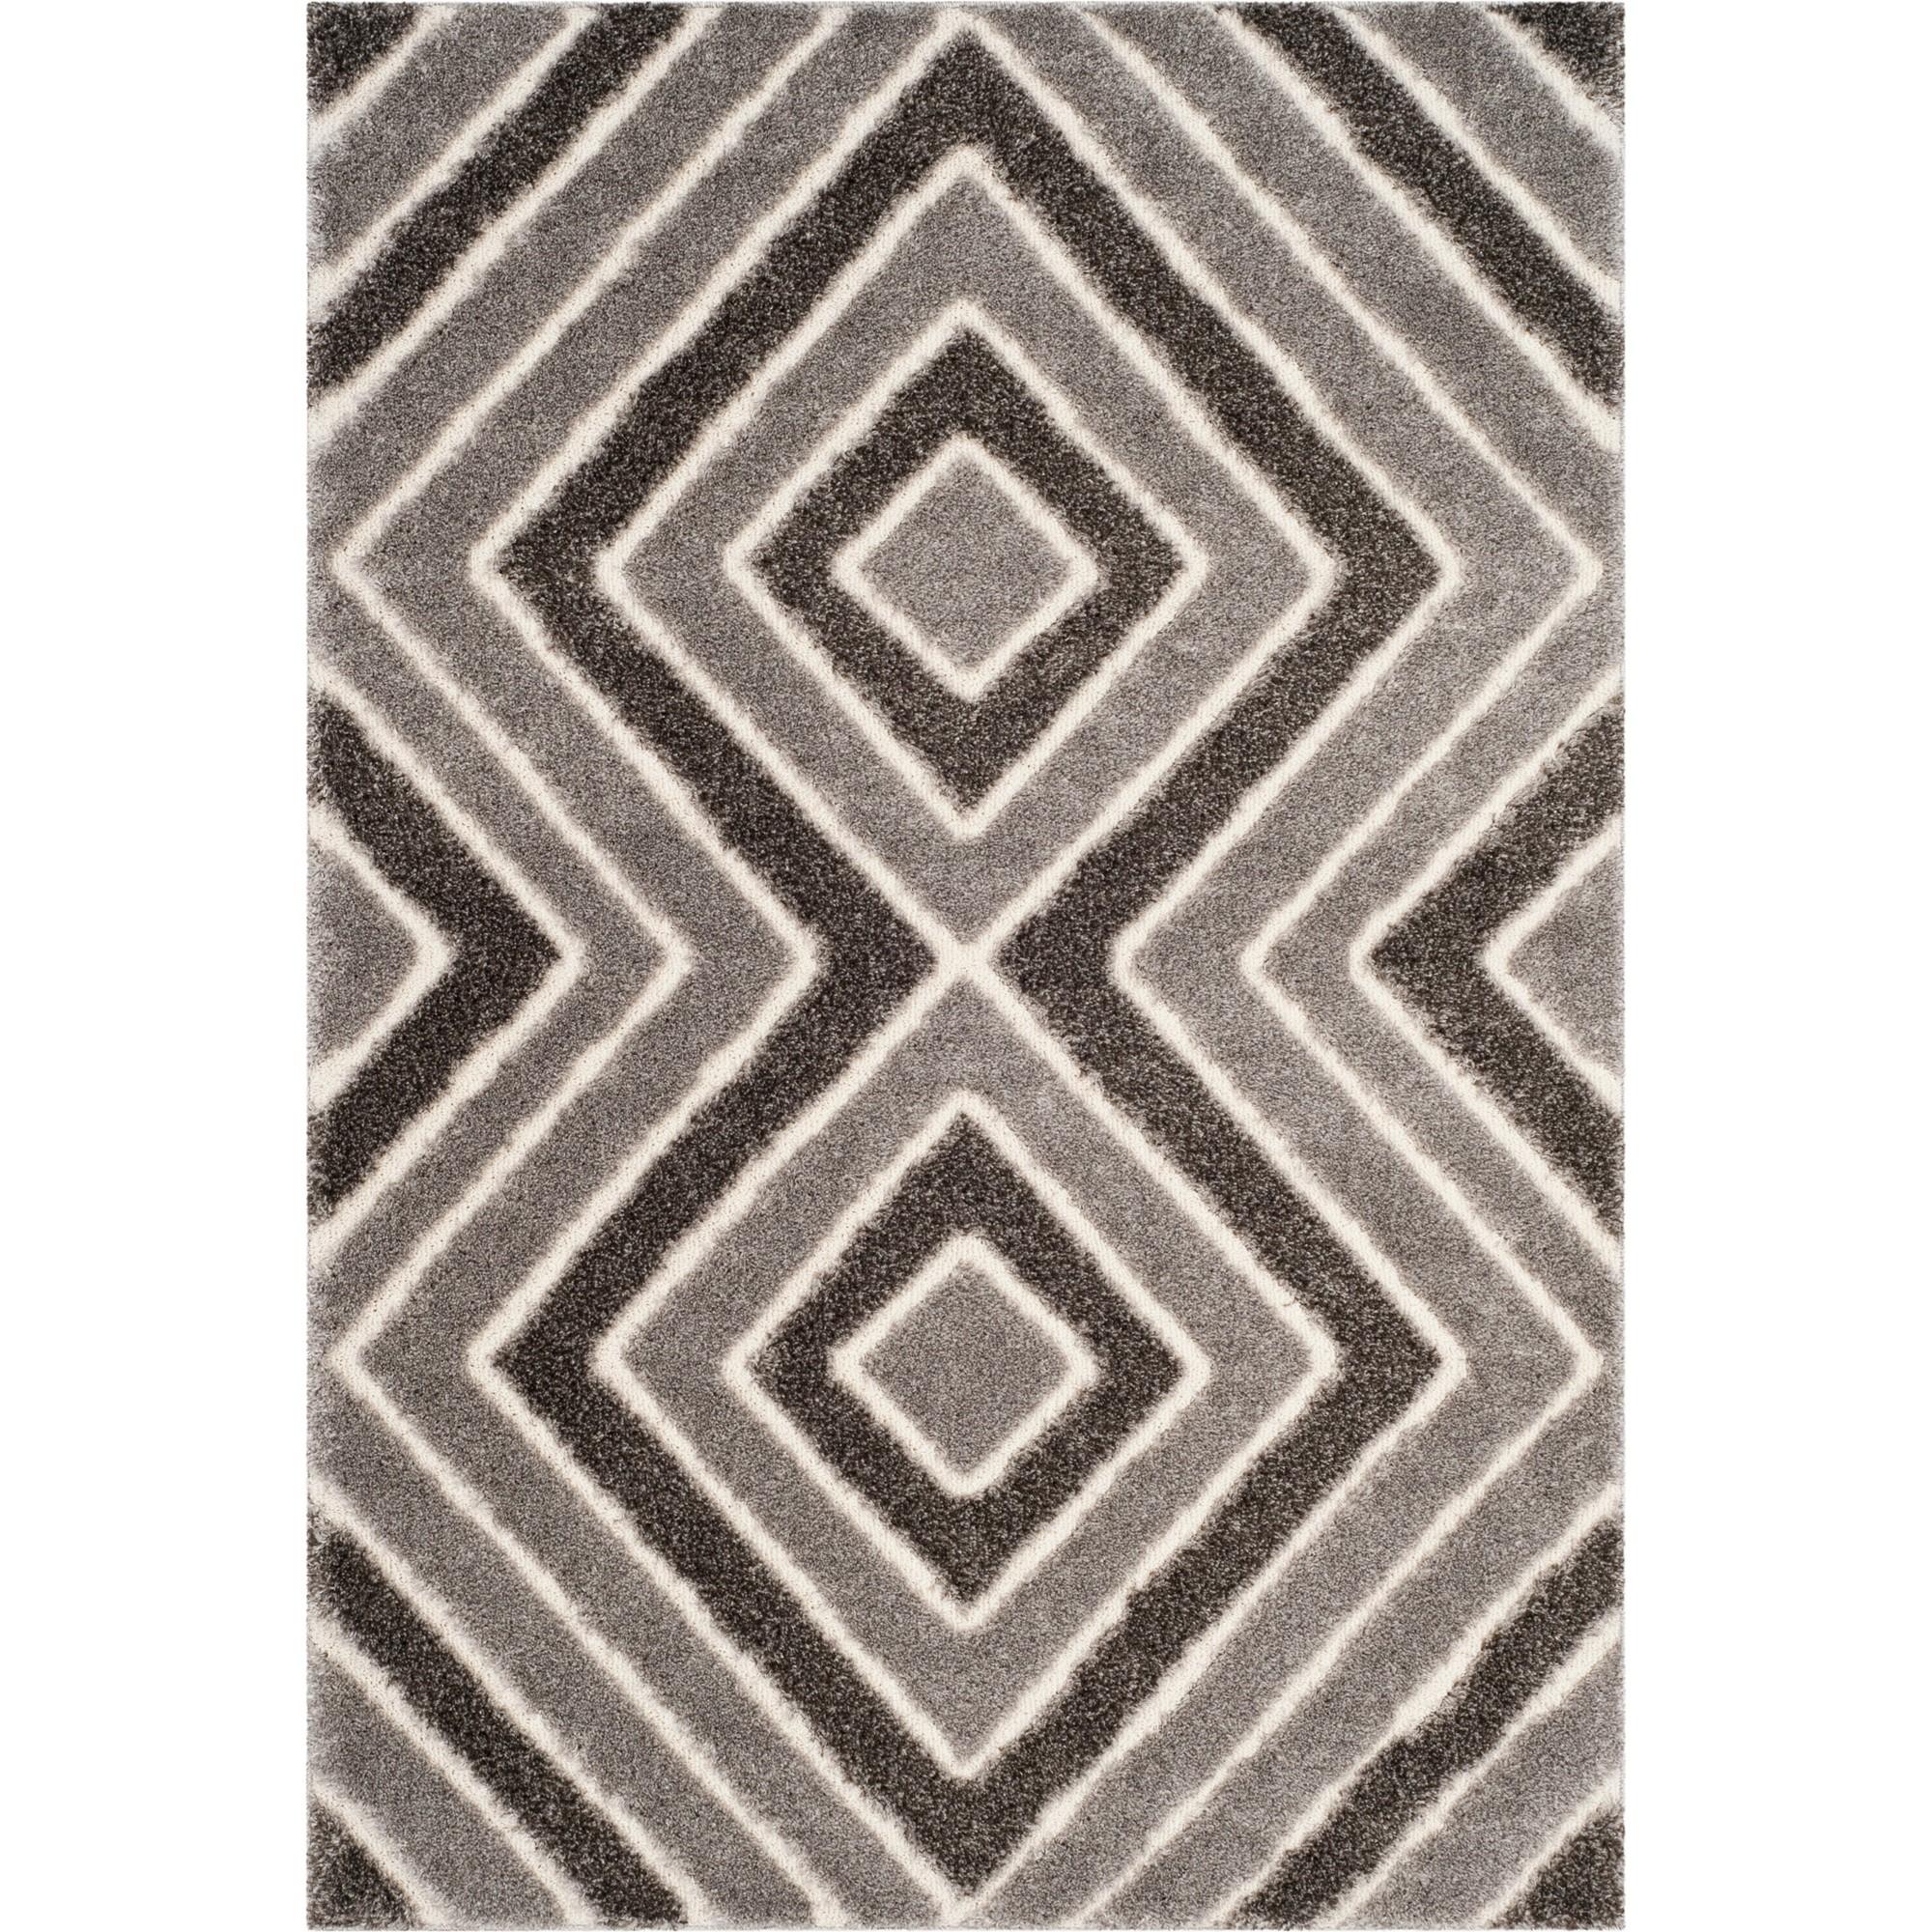 8'X10' Geometric Loomed Area Rug Taupe/Gray (Brown/Gray) - Safavieh